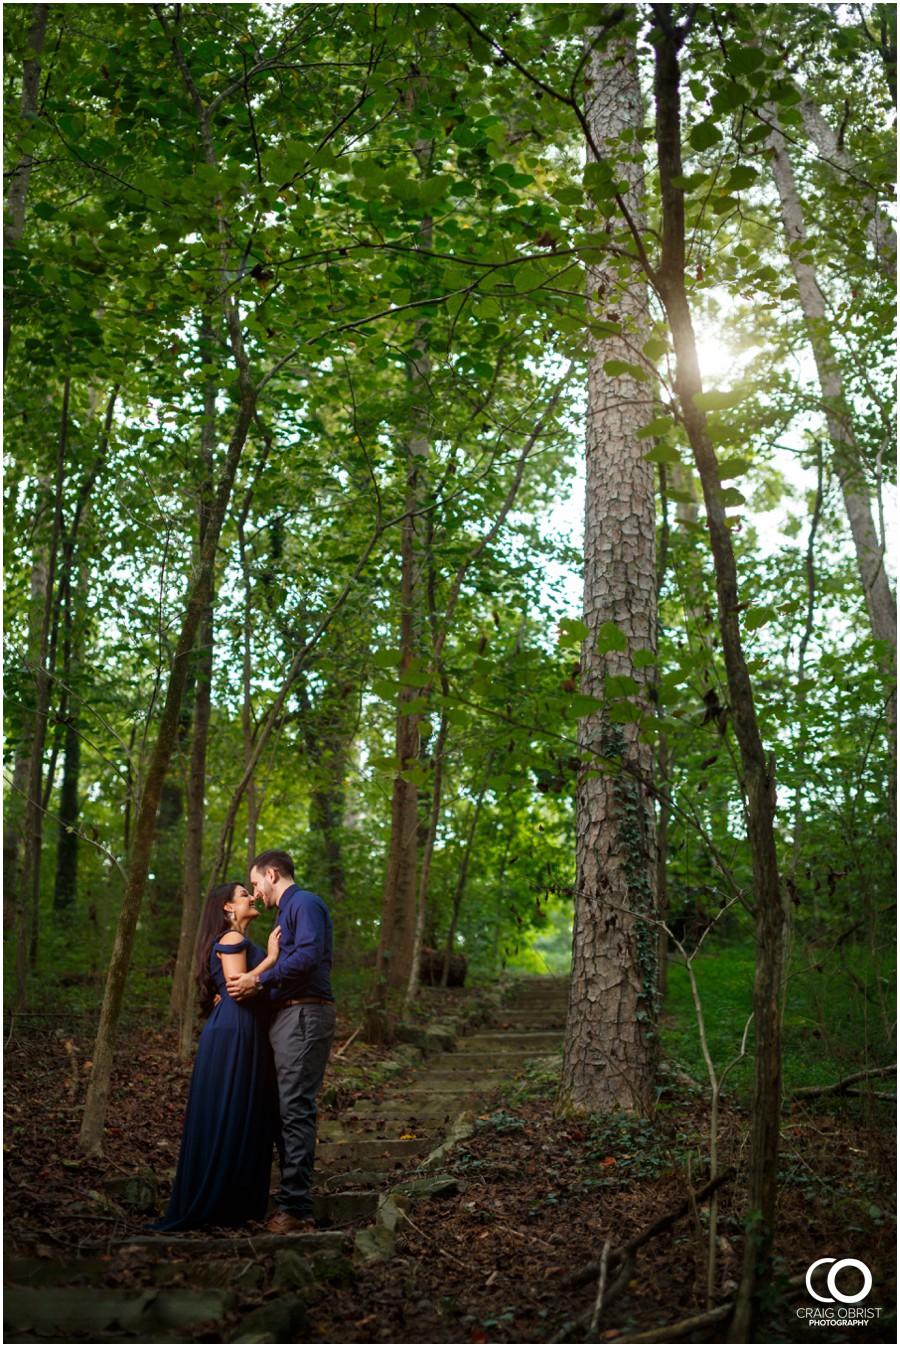 Emory-Lullwater-Park-Engagement-Portraits_0015.jpg